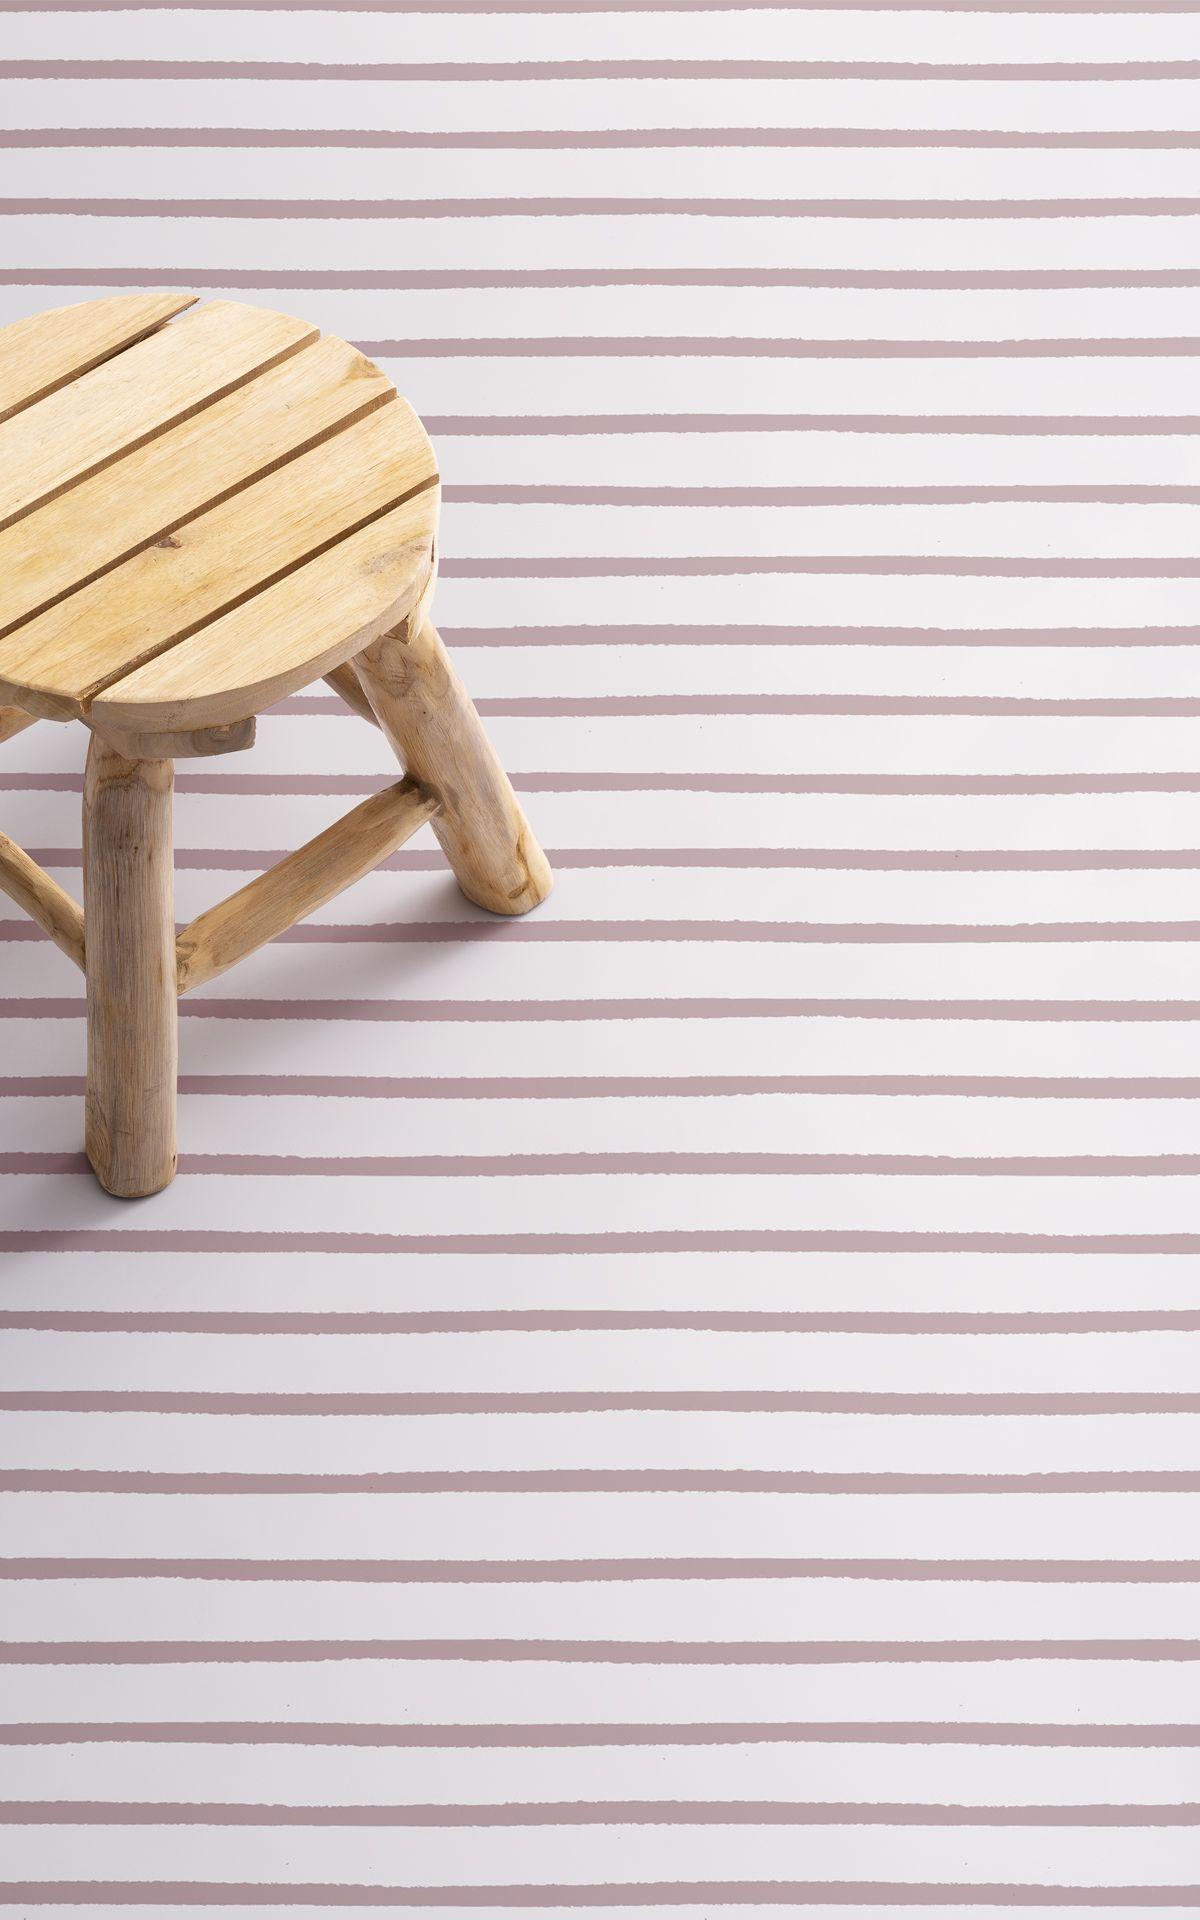 Rough Stripe Vinyl Flooring in 2020 Vinyl flooring